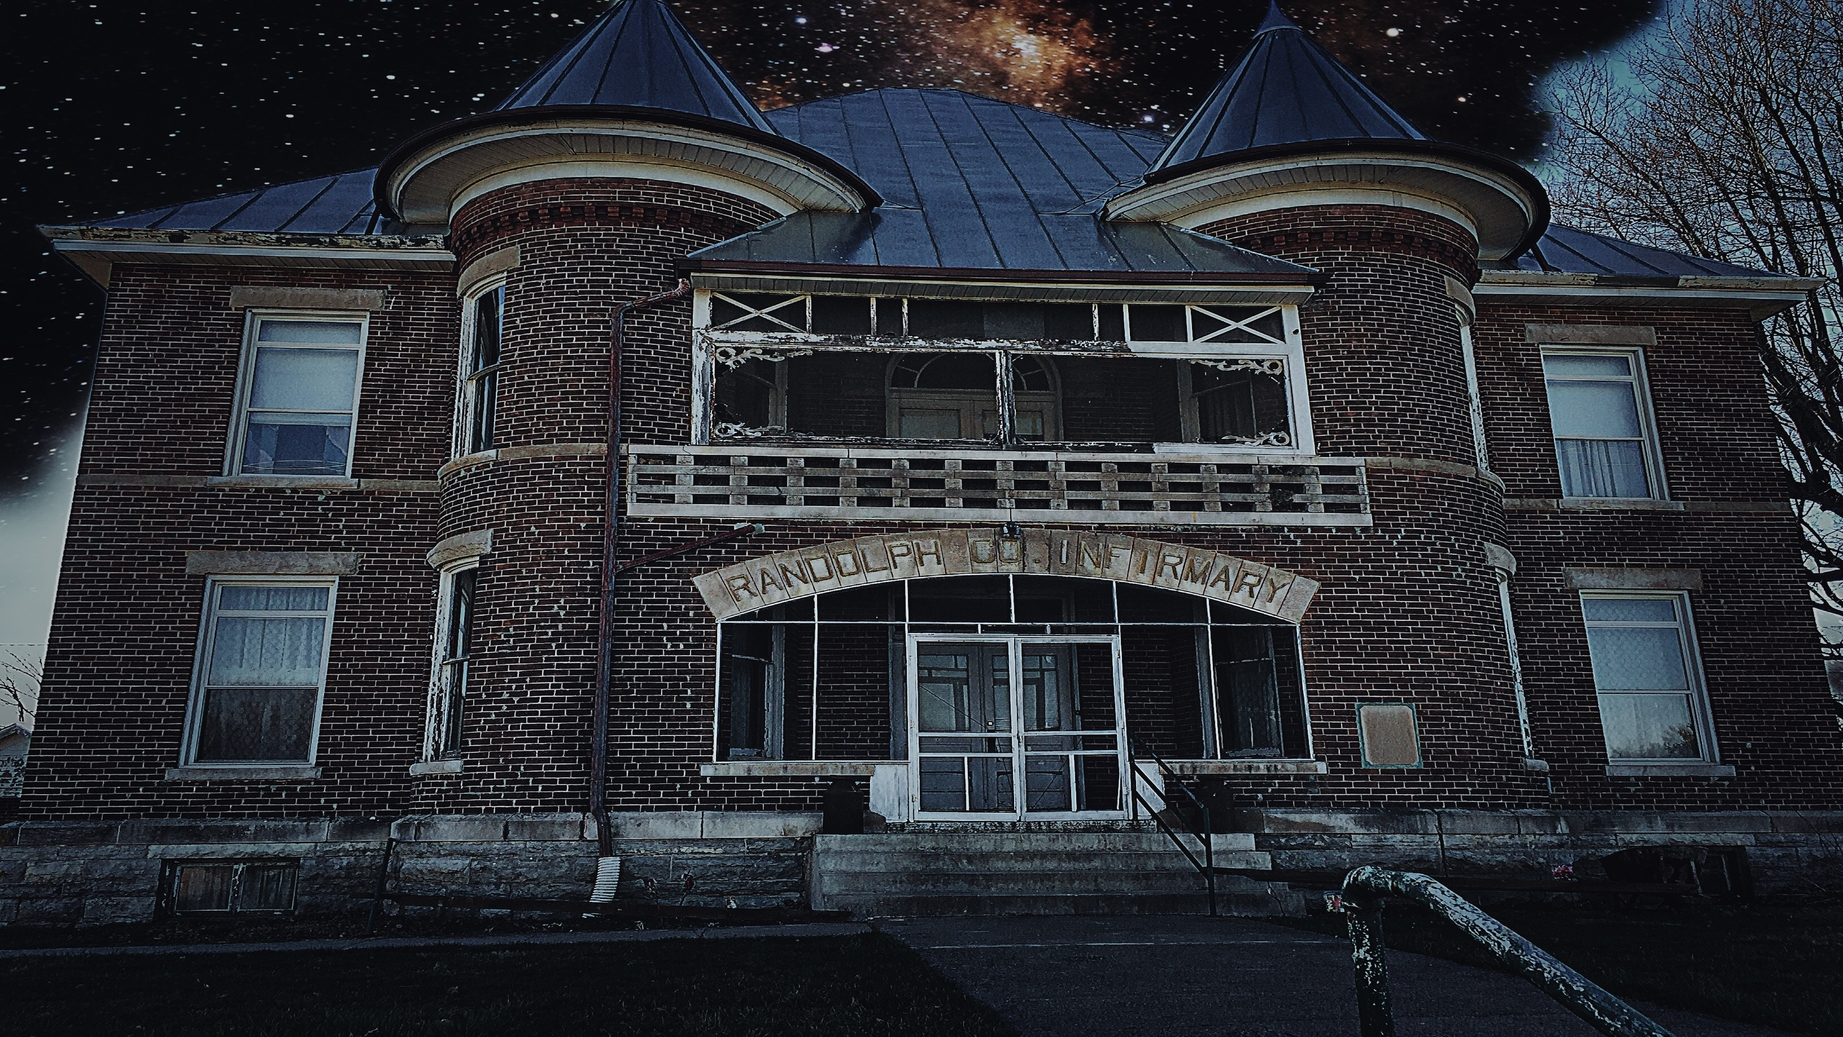 Randolph Asylum Ghost Hunt | Winchester, Indiana